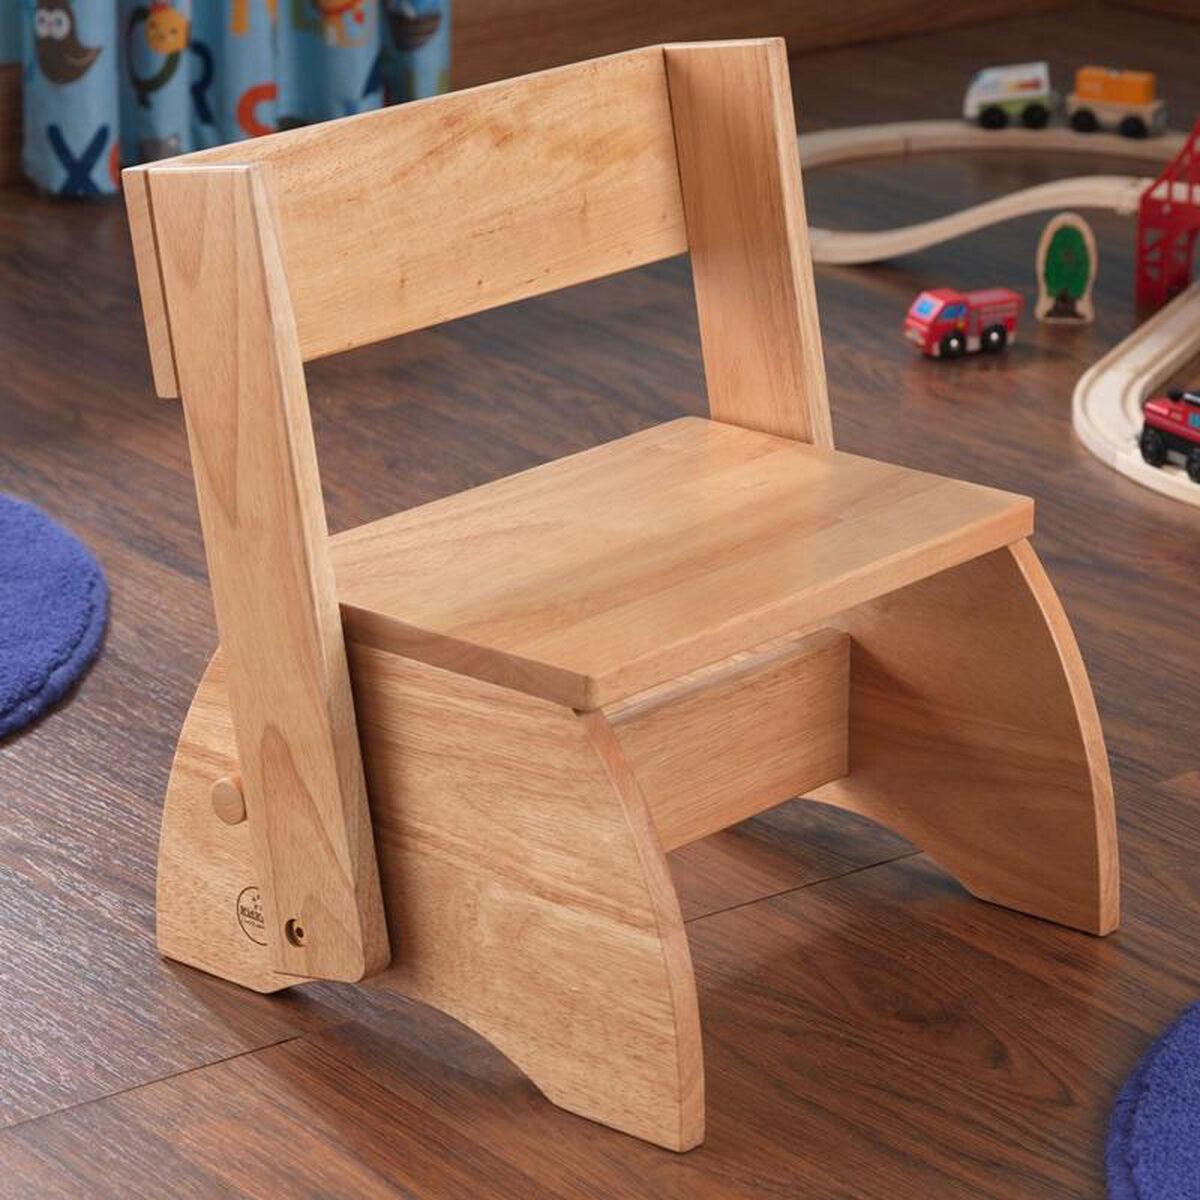 Kidkraft Kids Size Large Sturdy Hardwood Flip Step To Sit